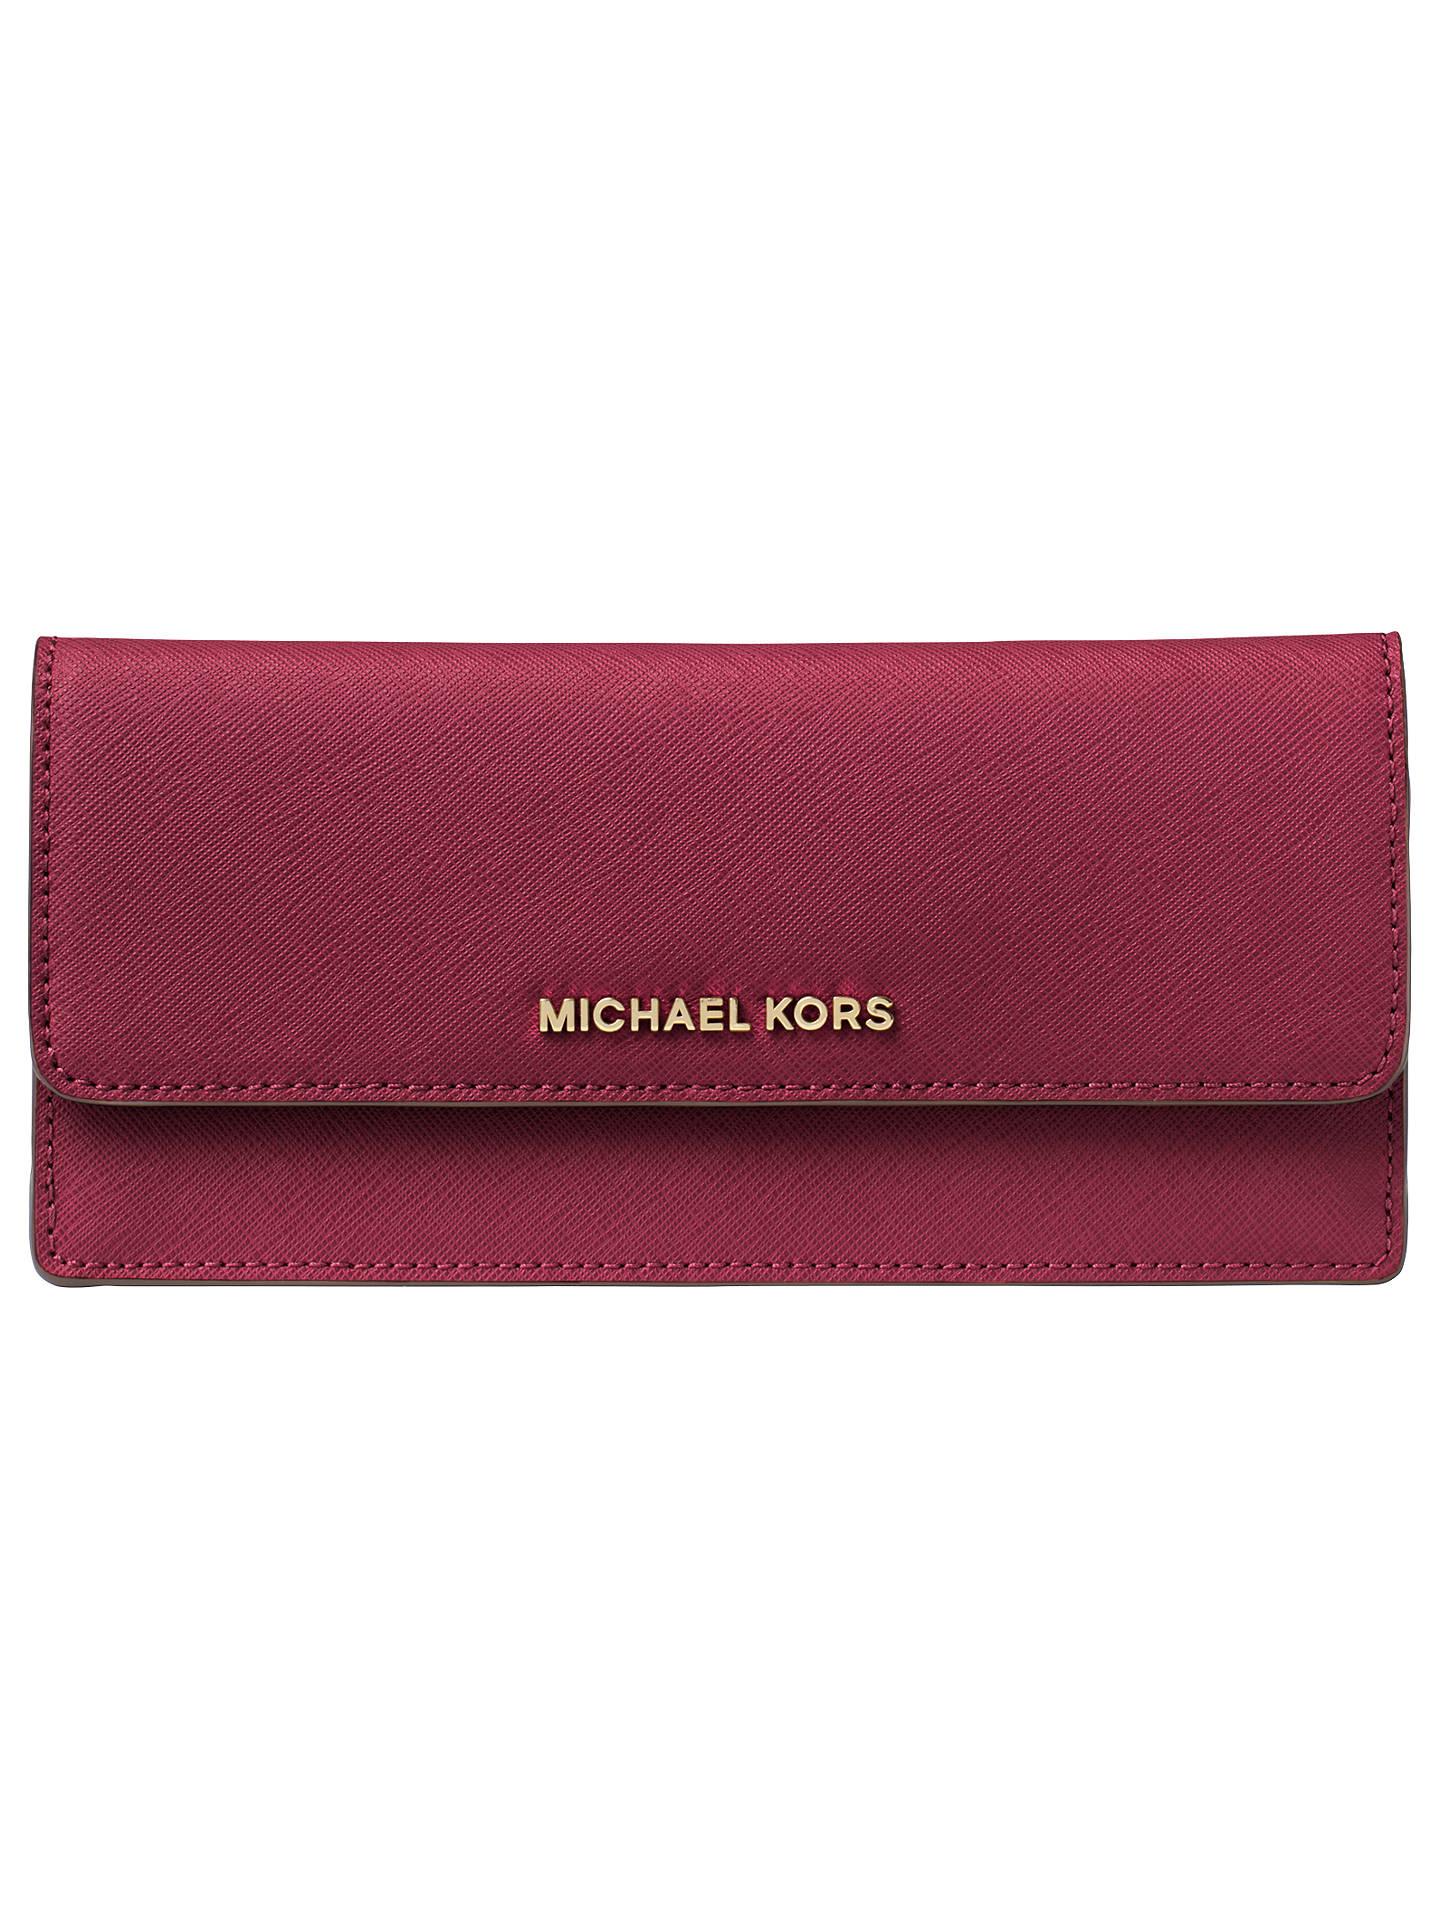 ba92c21e039a MICHAEL Michael Kors Jet Set Travel Leather Flapover Wallet at John ...